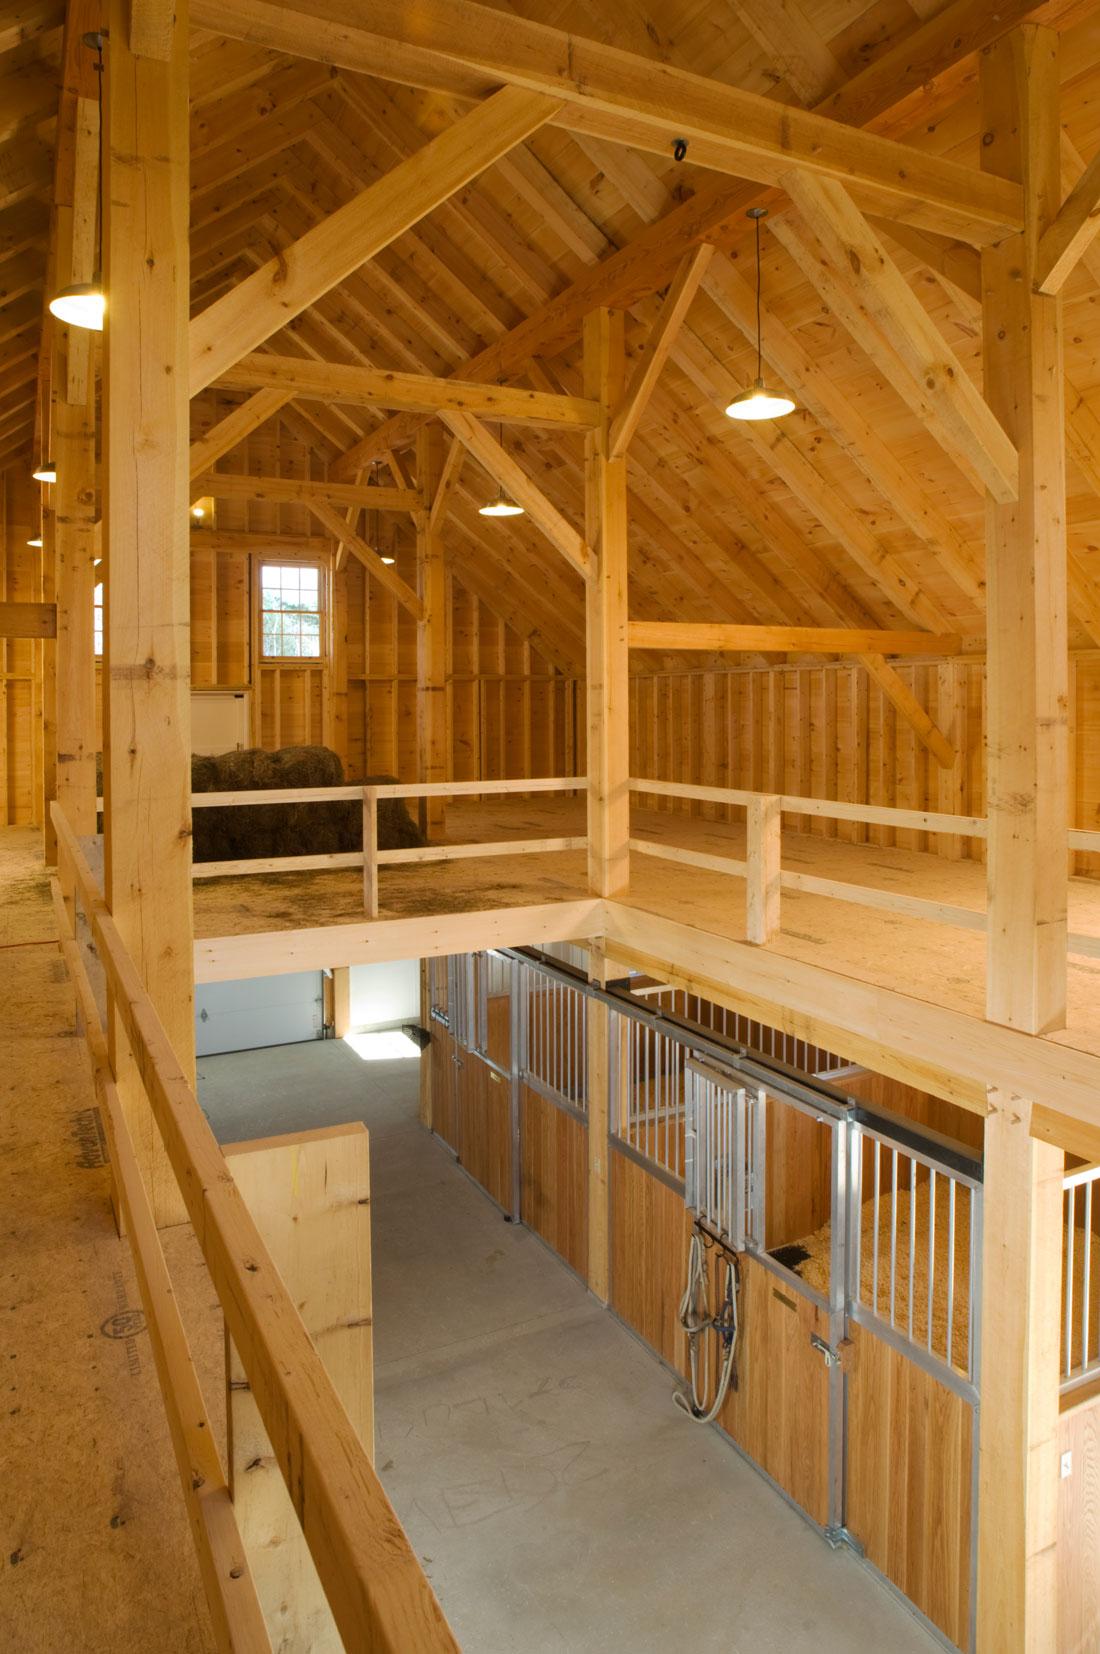 Houses and Barns  Cumberland horse barn